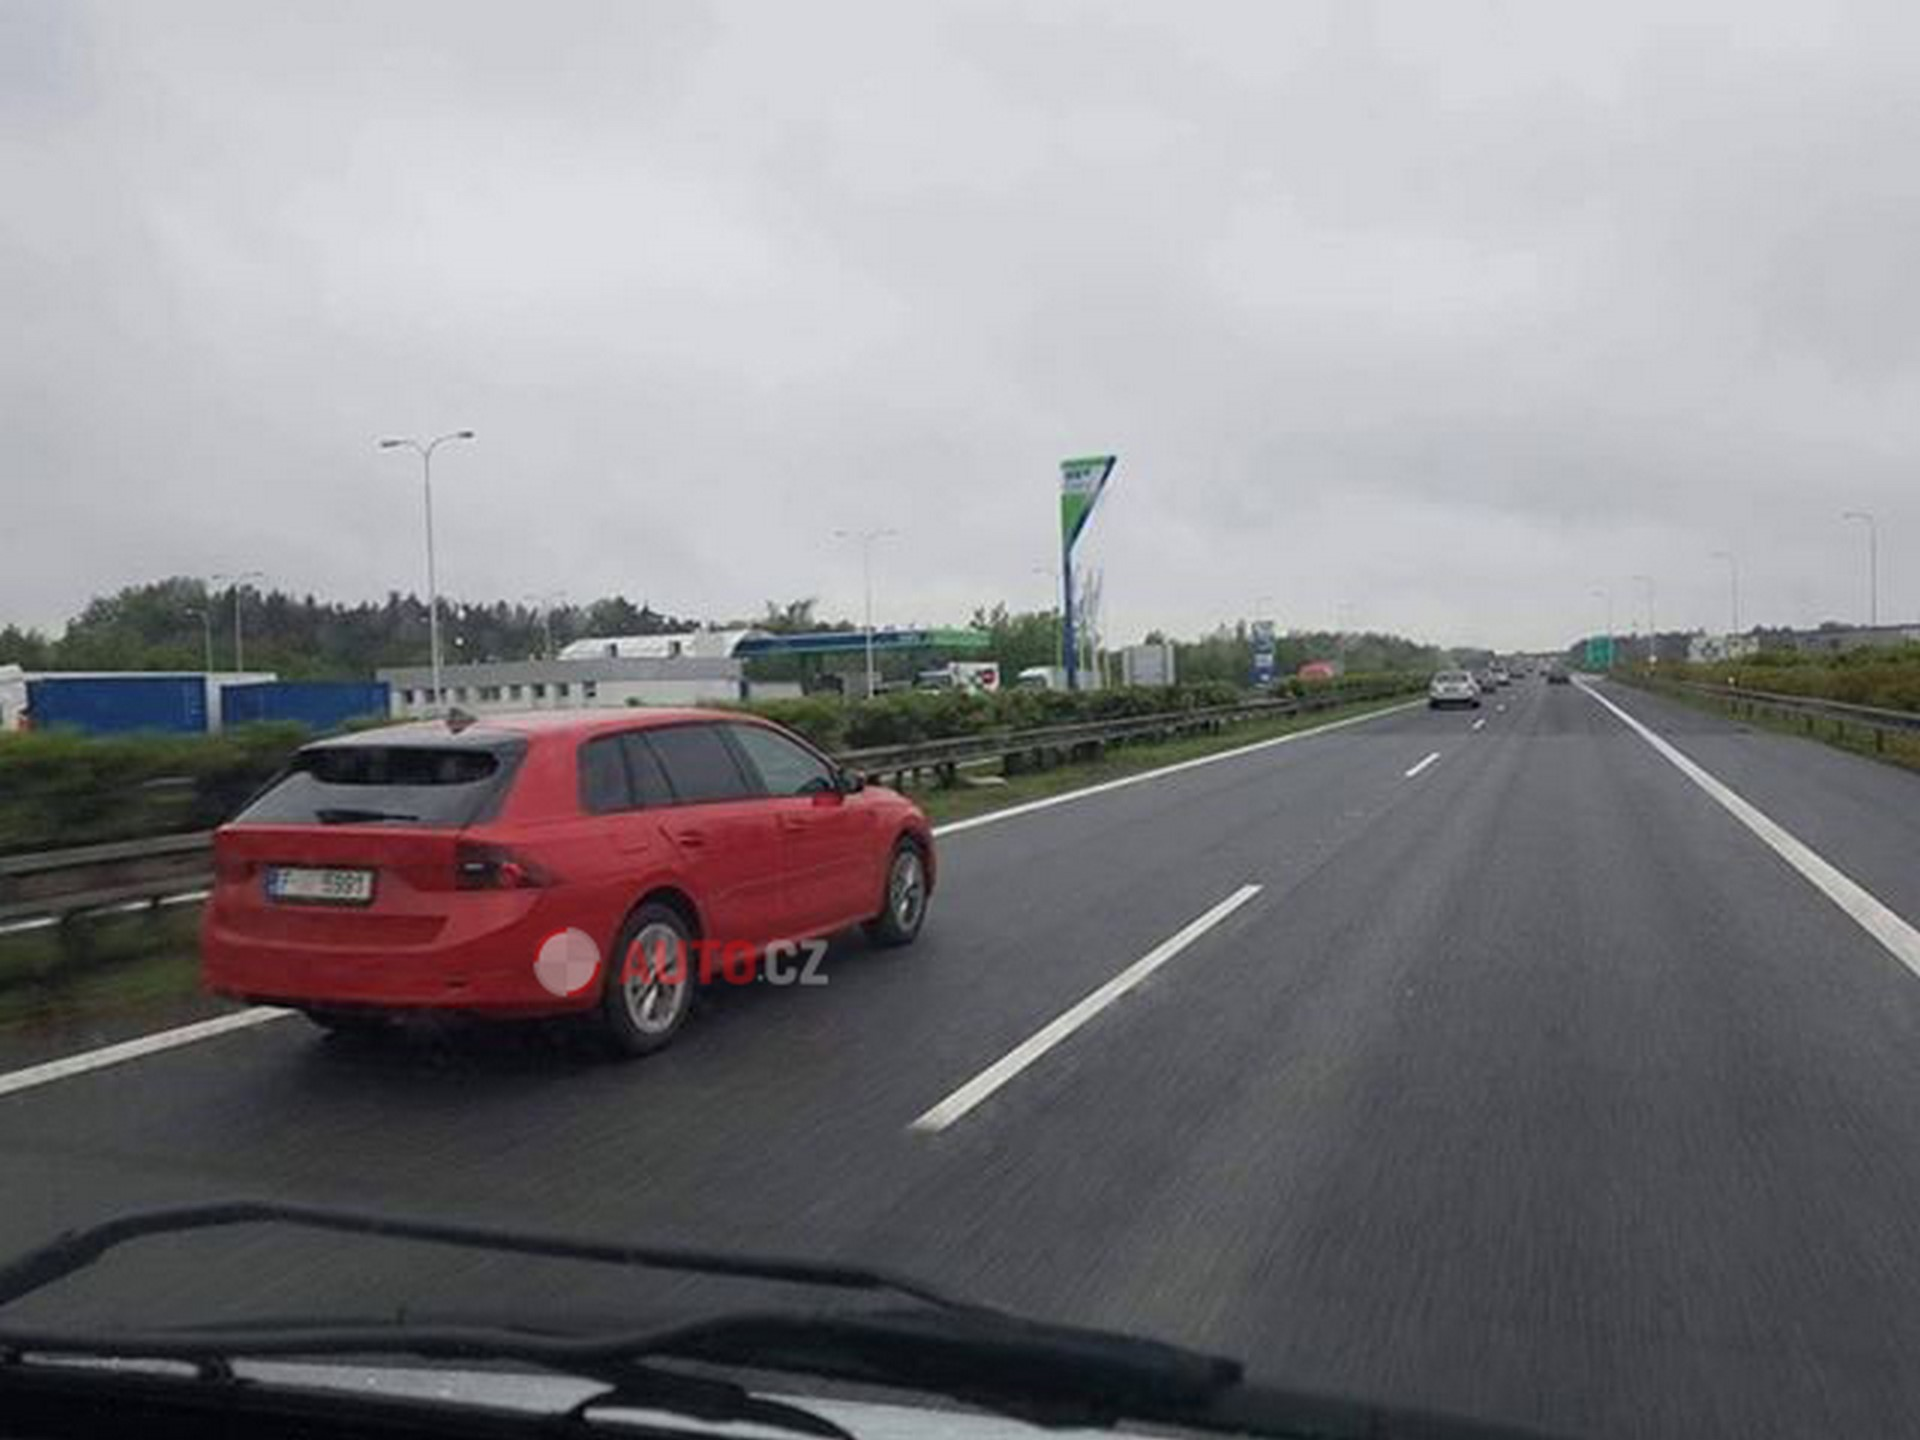 Skoda-Octavia-2020-spy-photos-12